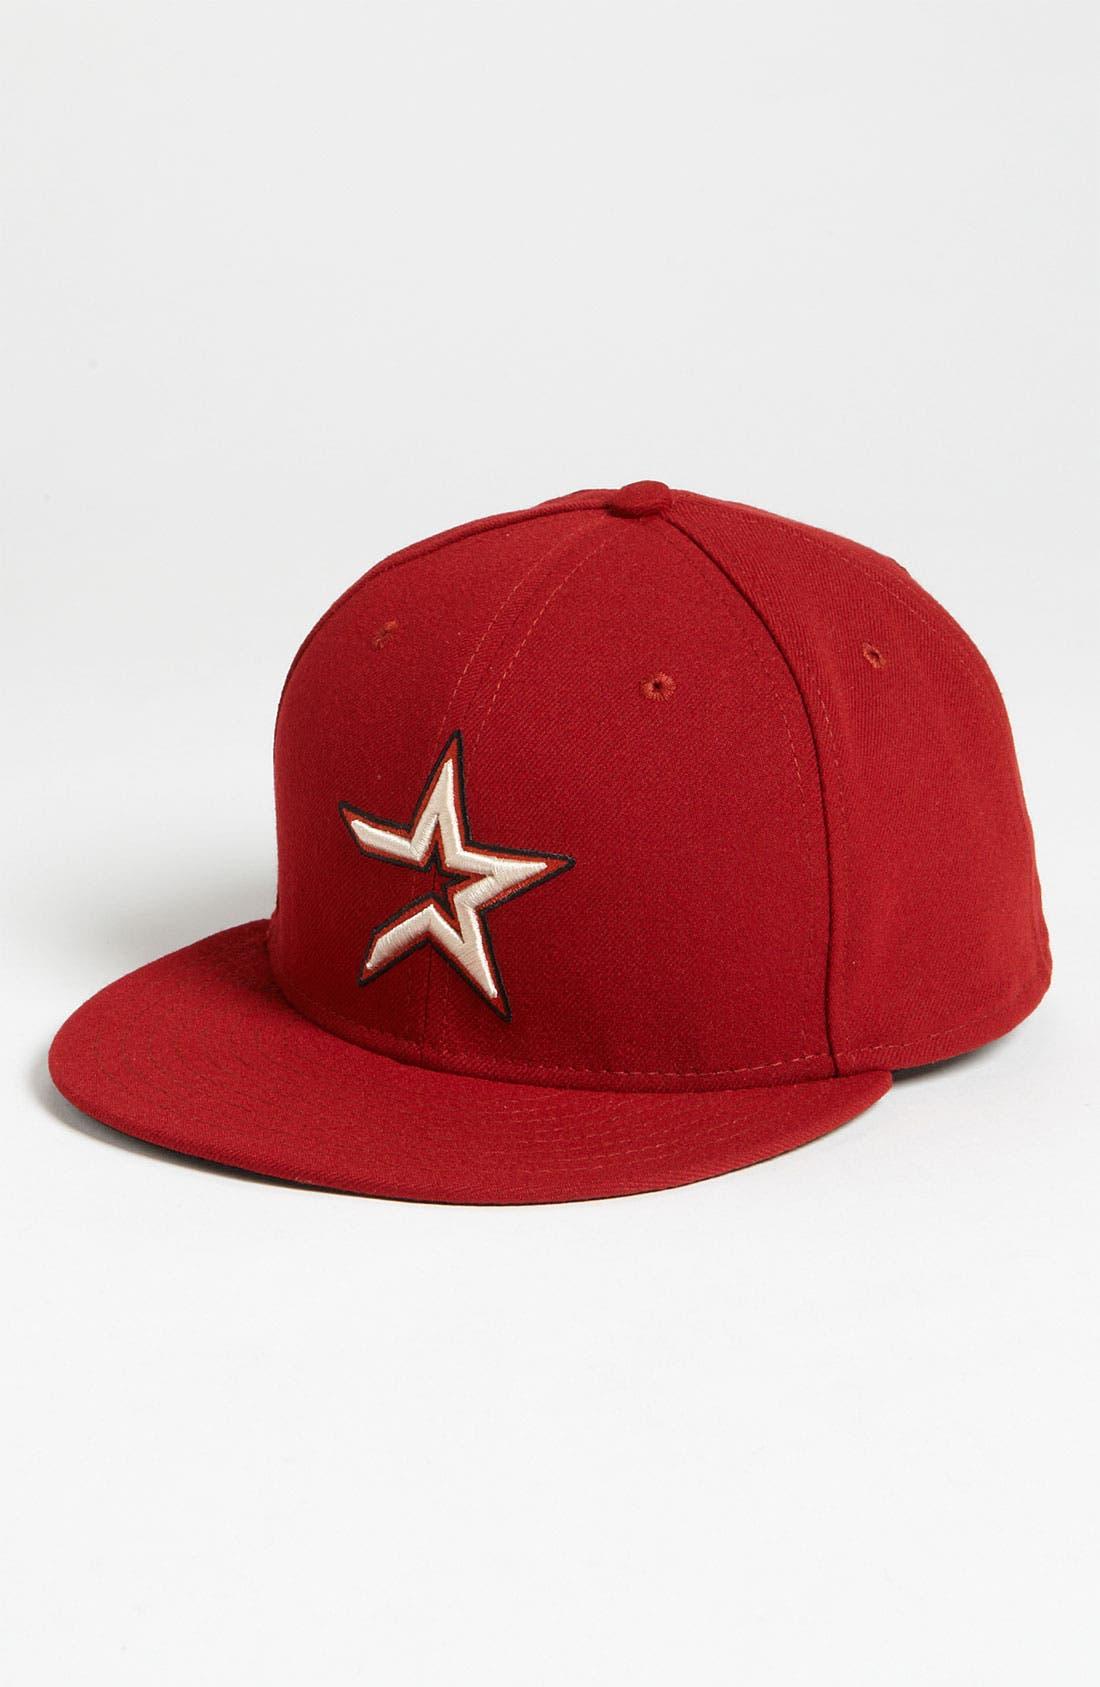 Main Image - New Era Cap 'Houston Astros' Baseball Cap